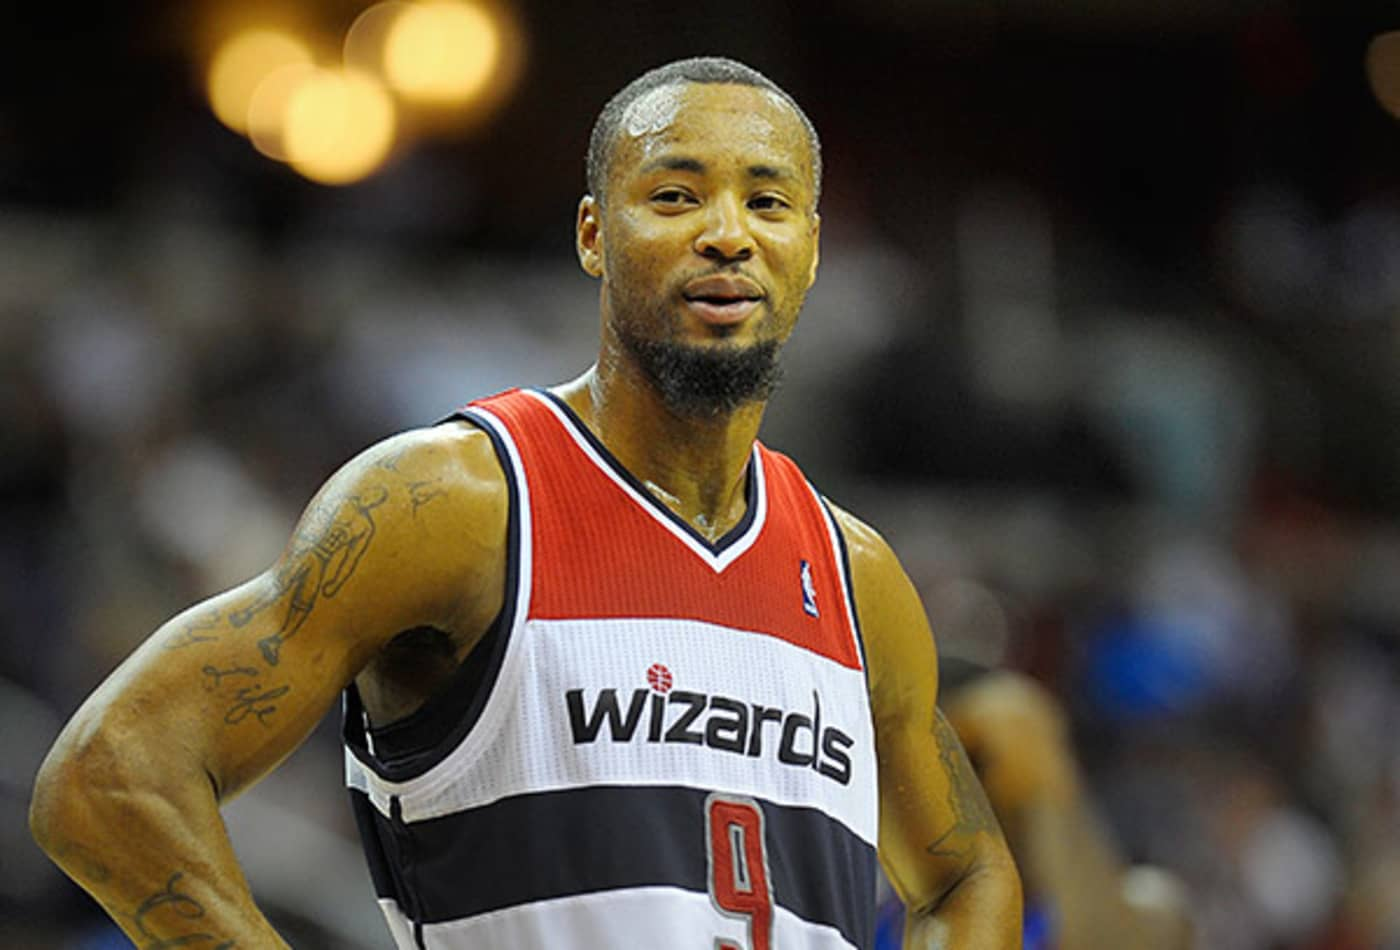 Rashard-Lewis-Most-Overpaid-NBA-Players.jpg